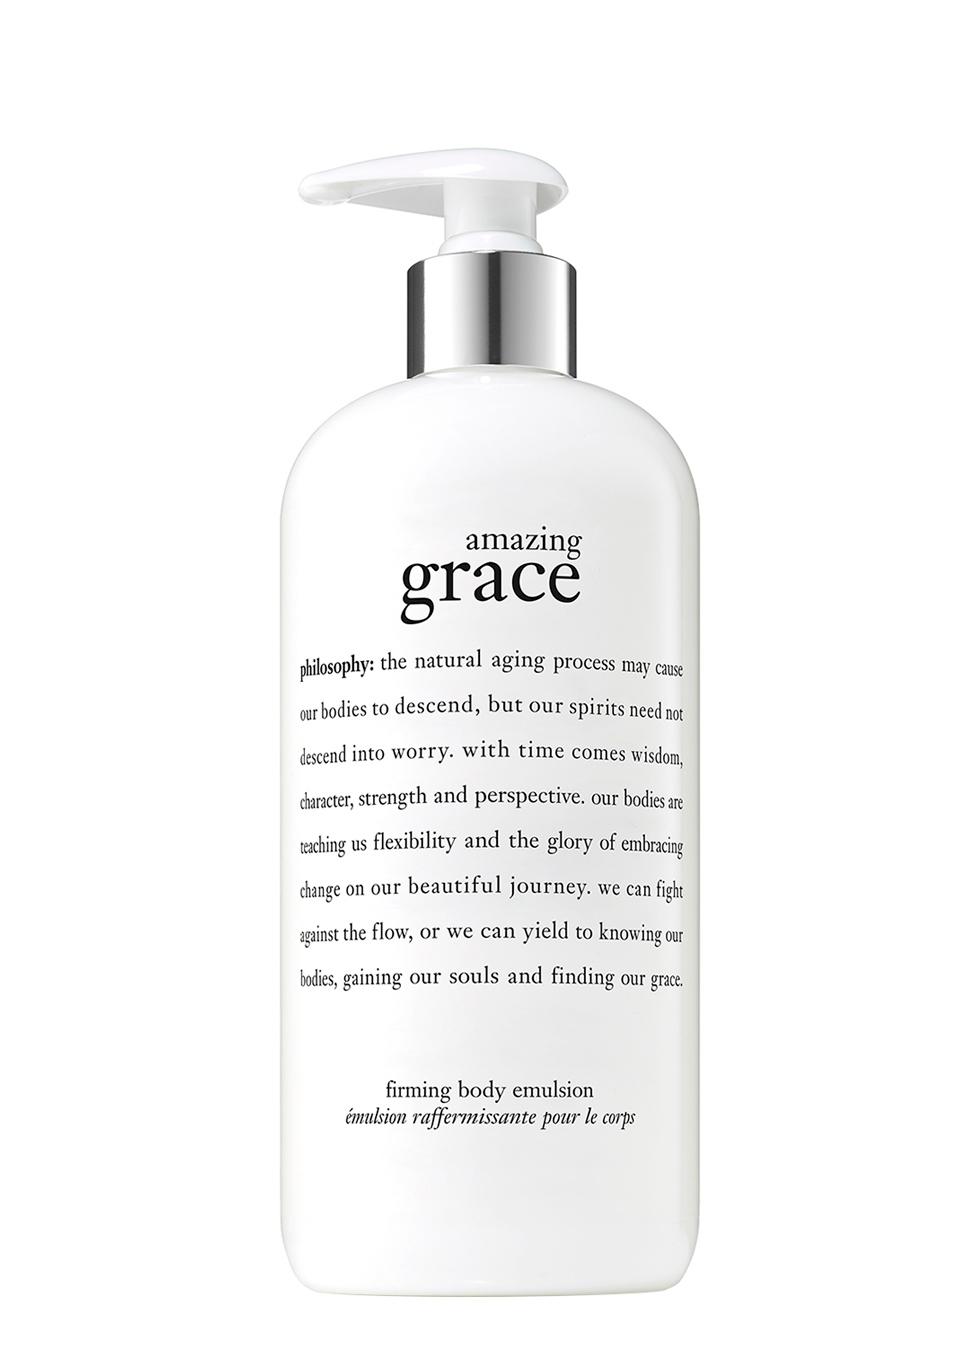 Amazing Grace Firming Body Emulsion 480ml